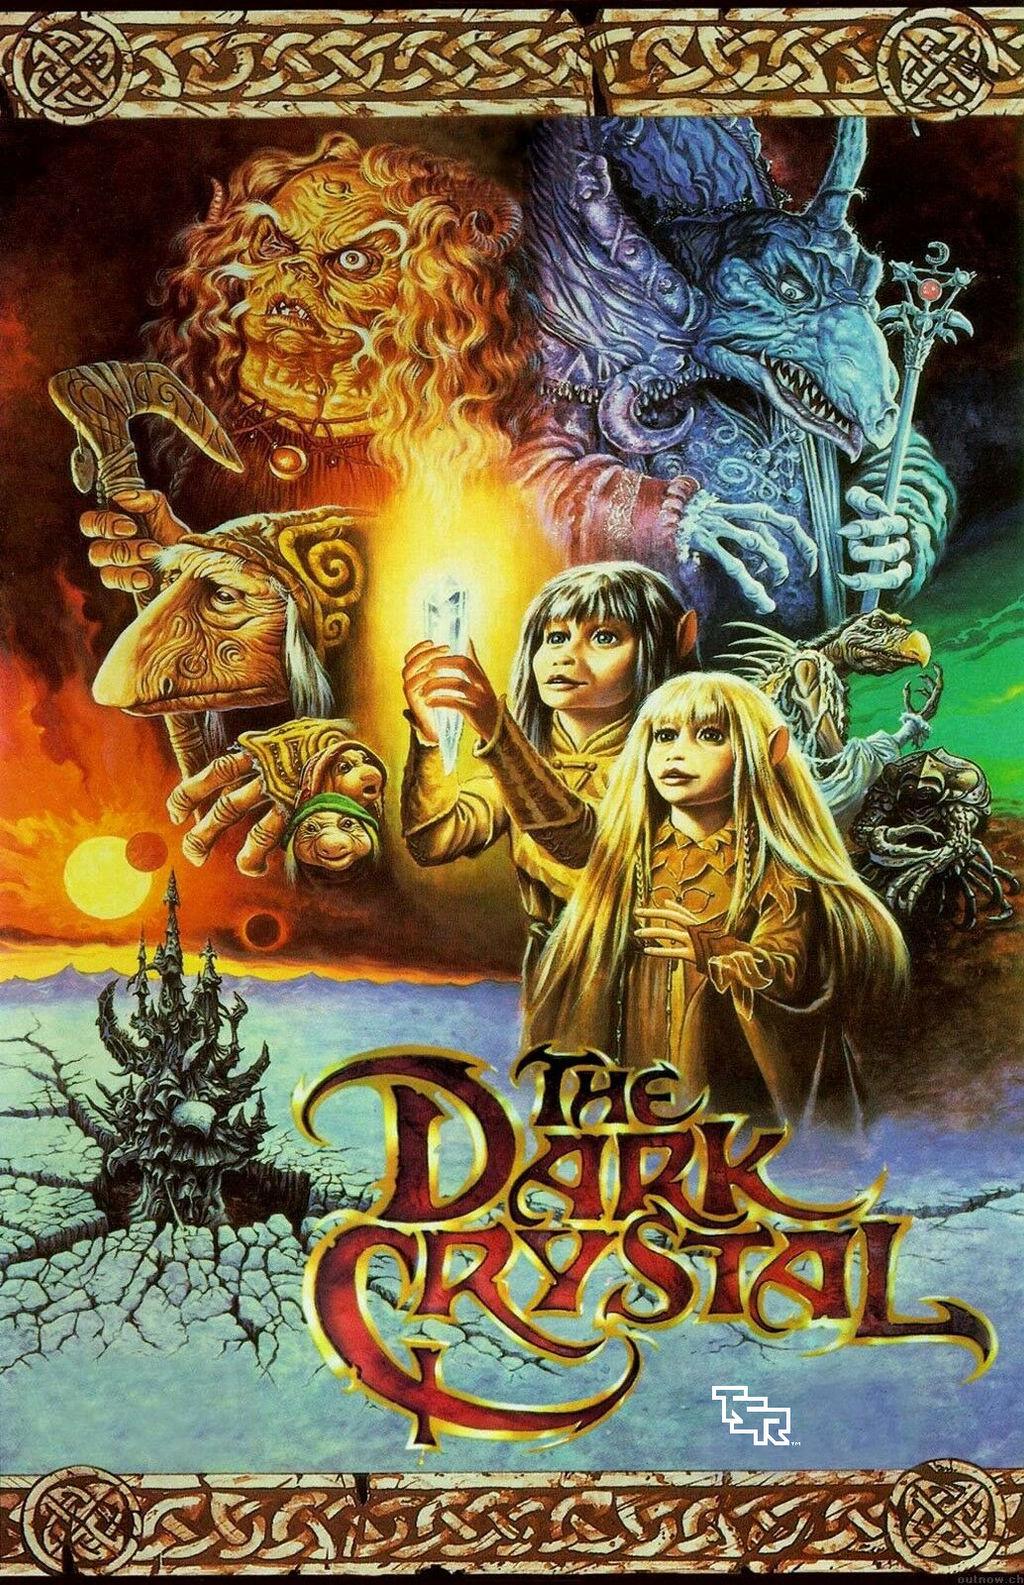 tsr__inc__s_the_dark_crystal_by_lurch_jr_deikoqo-fullview.jpg